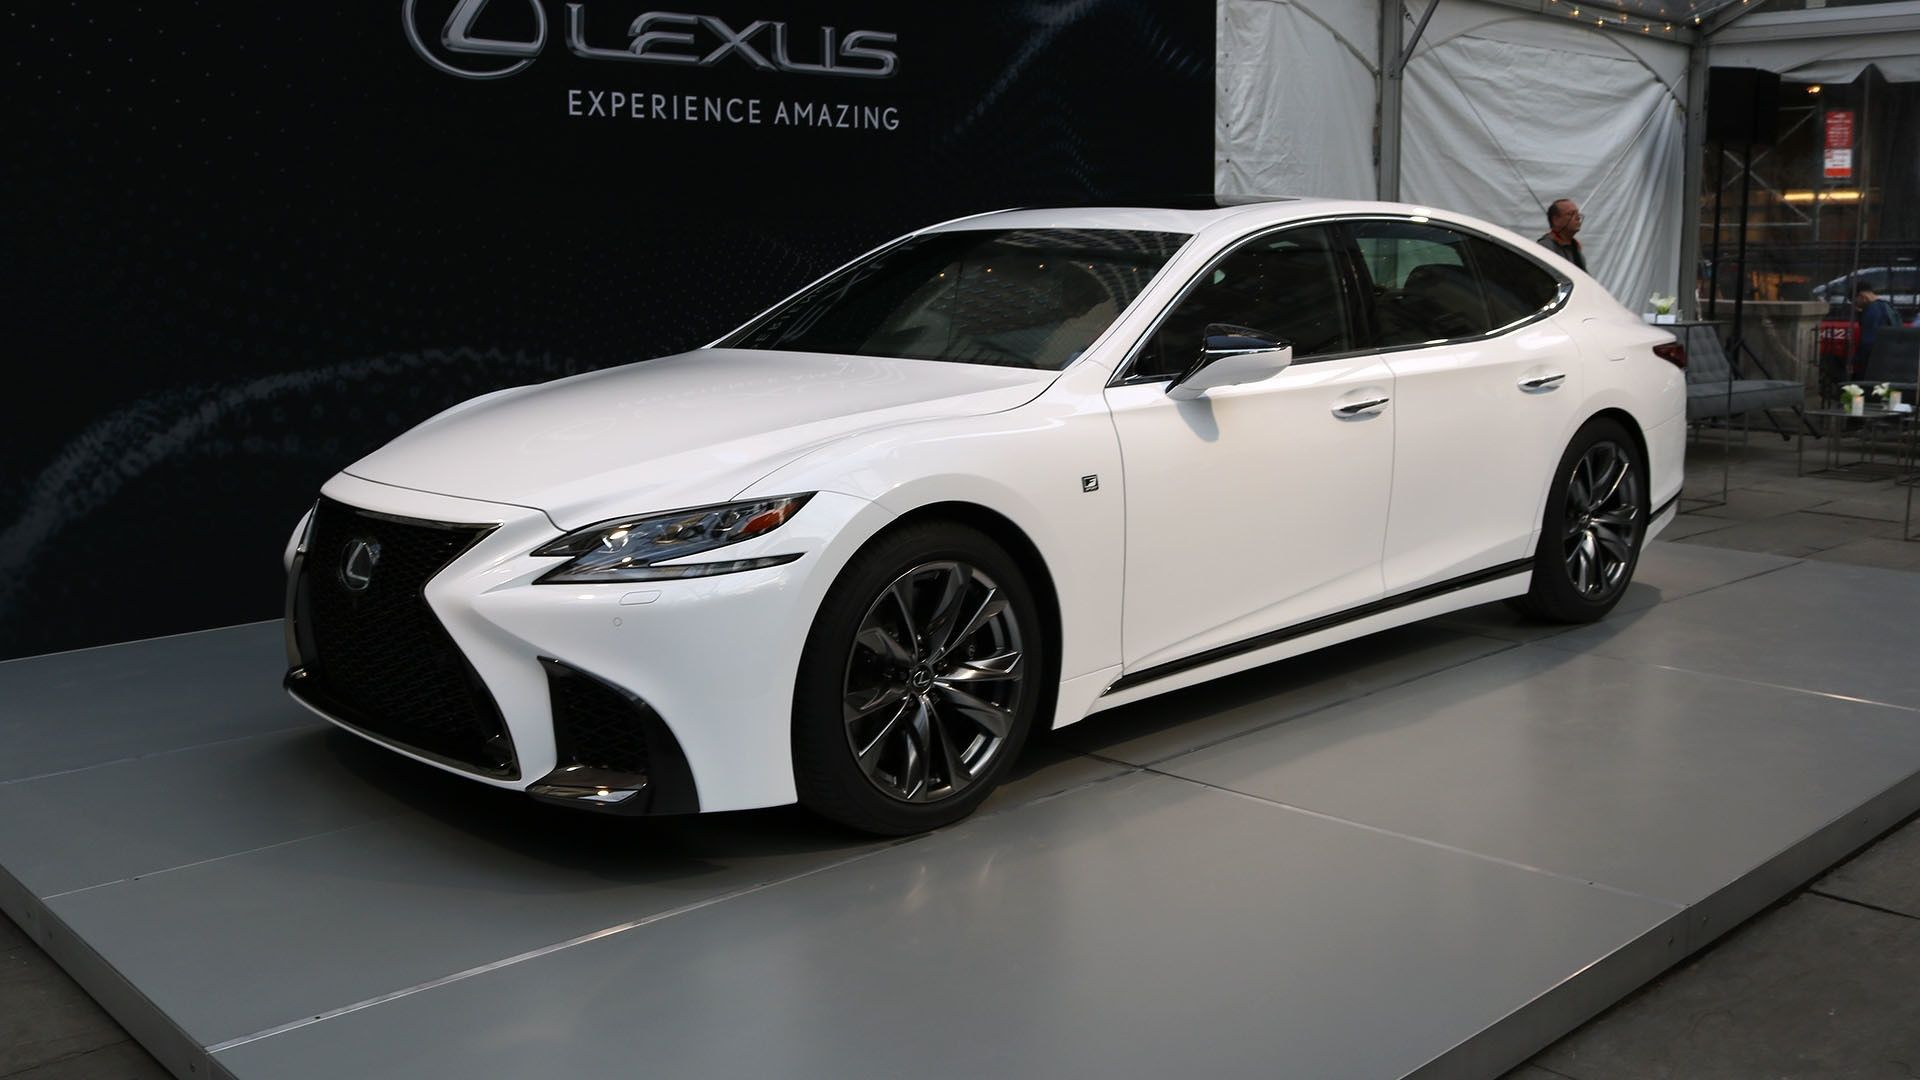 2019 Lexus Ls 500 Lexus Sports Car Lexus Ls Luxury Cars